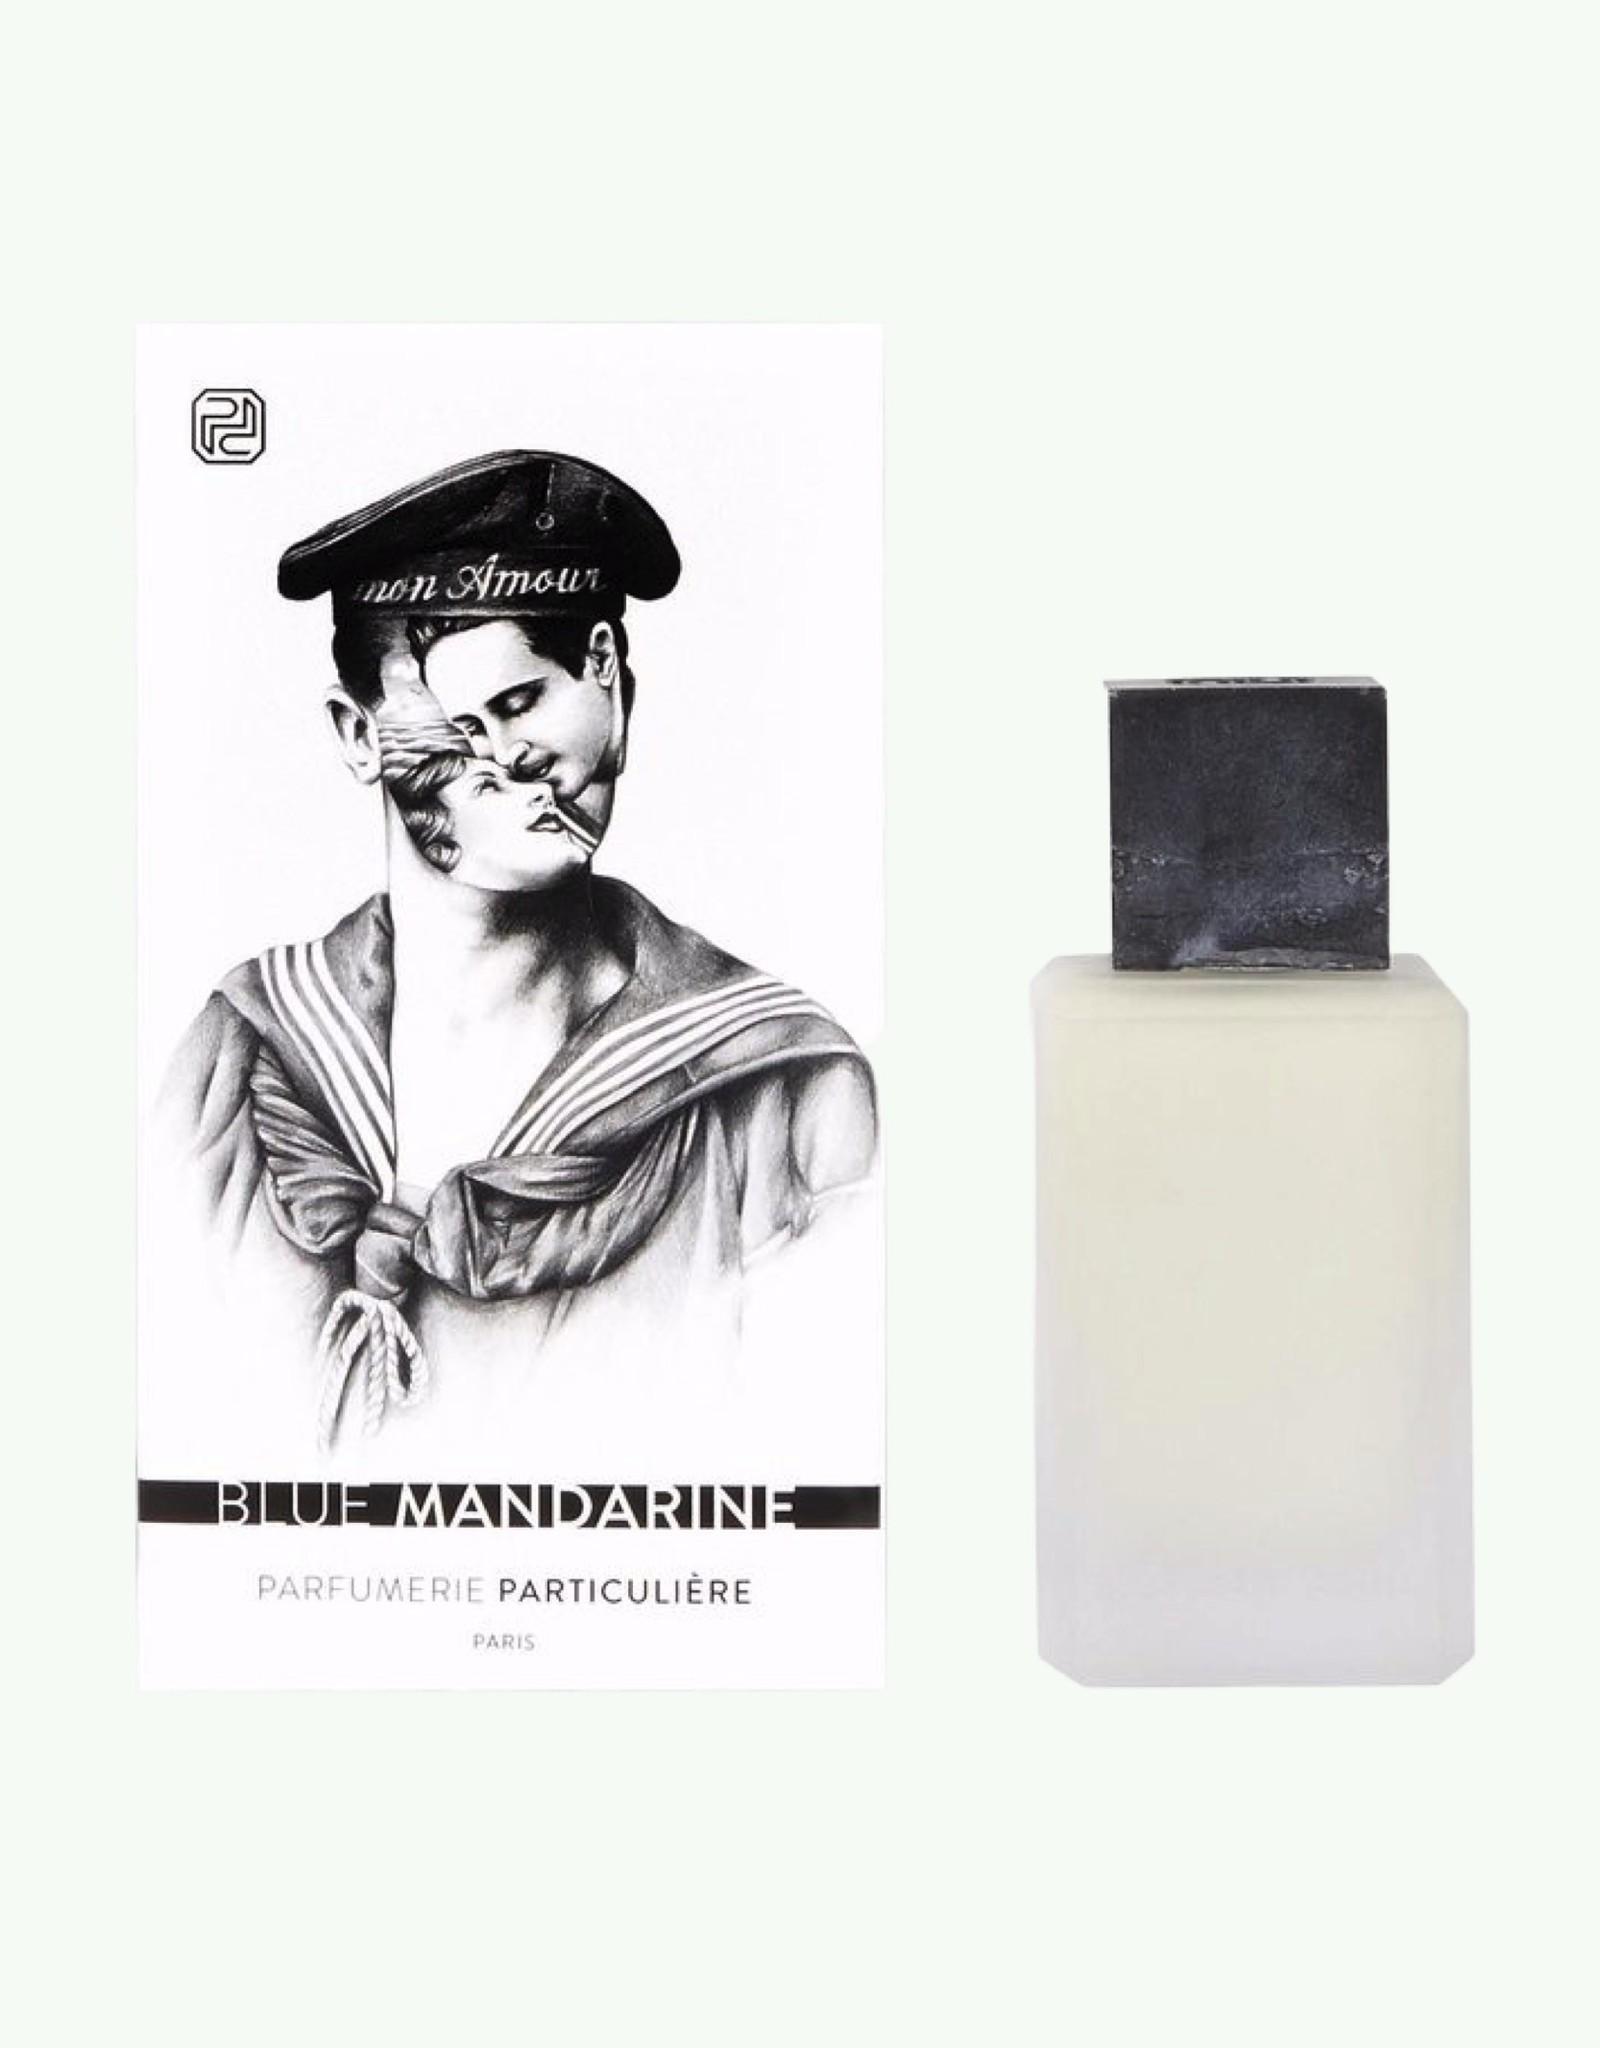 Parfumerie Particulière Parfumerie Particulière - Blue Mandarine - Extrait de Parfum